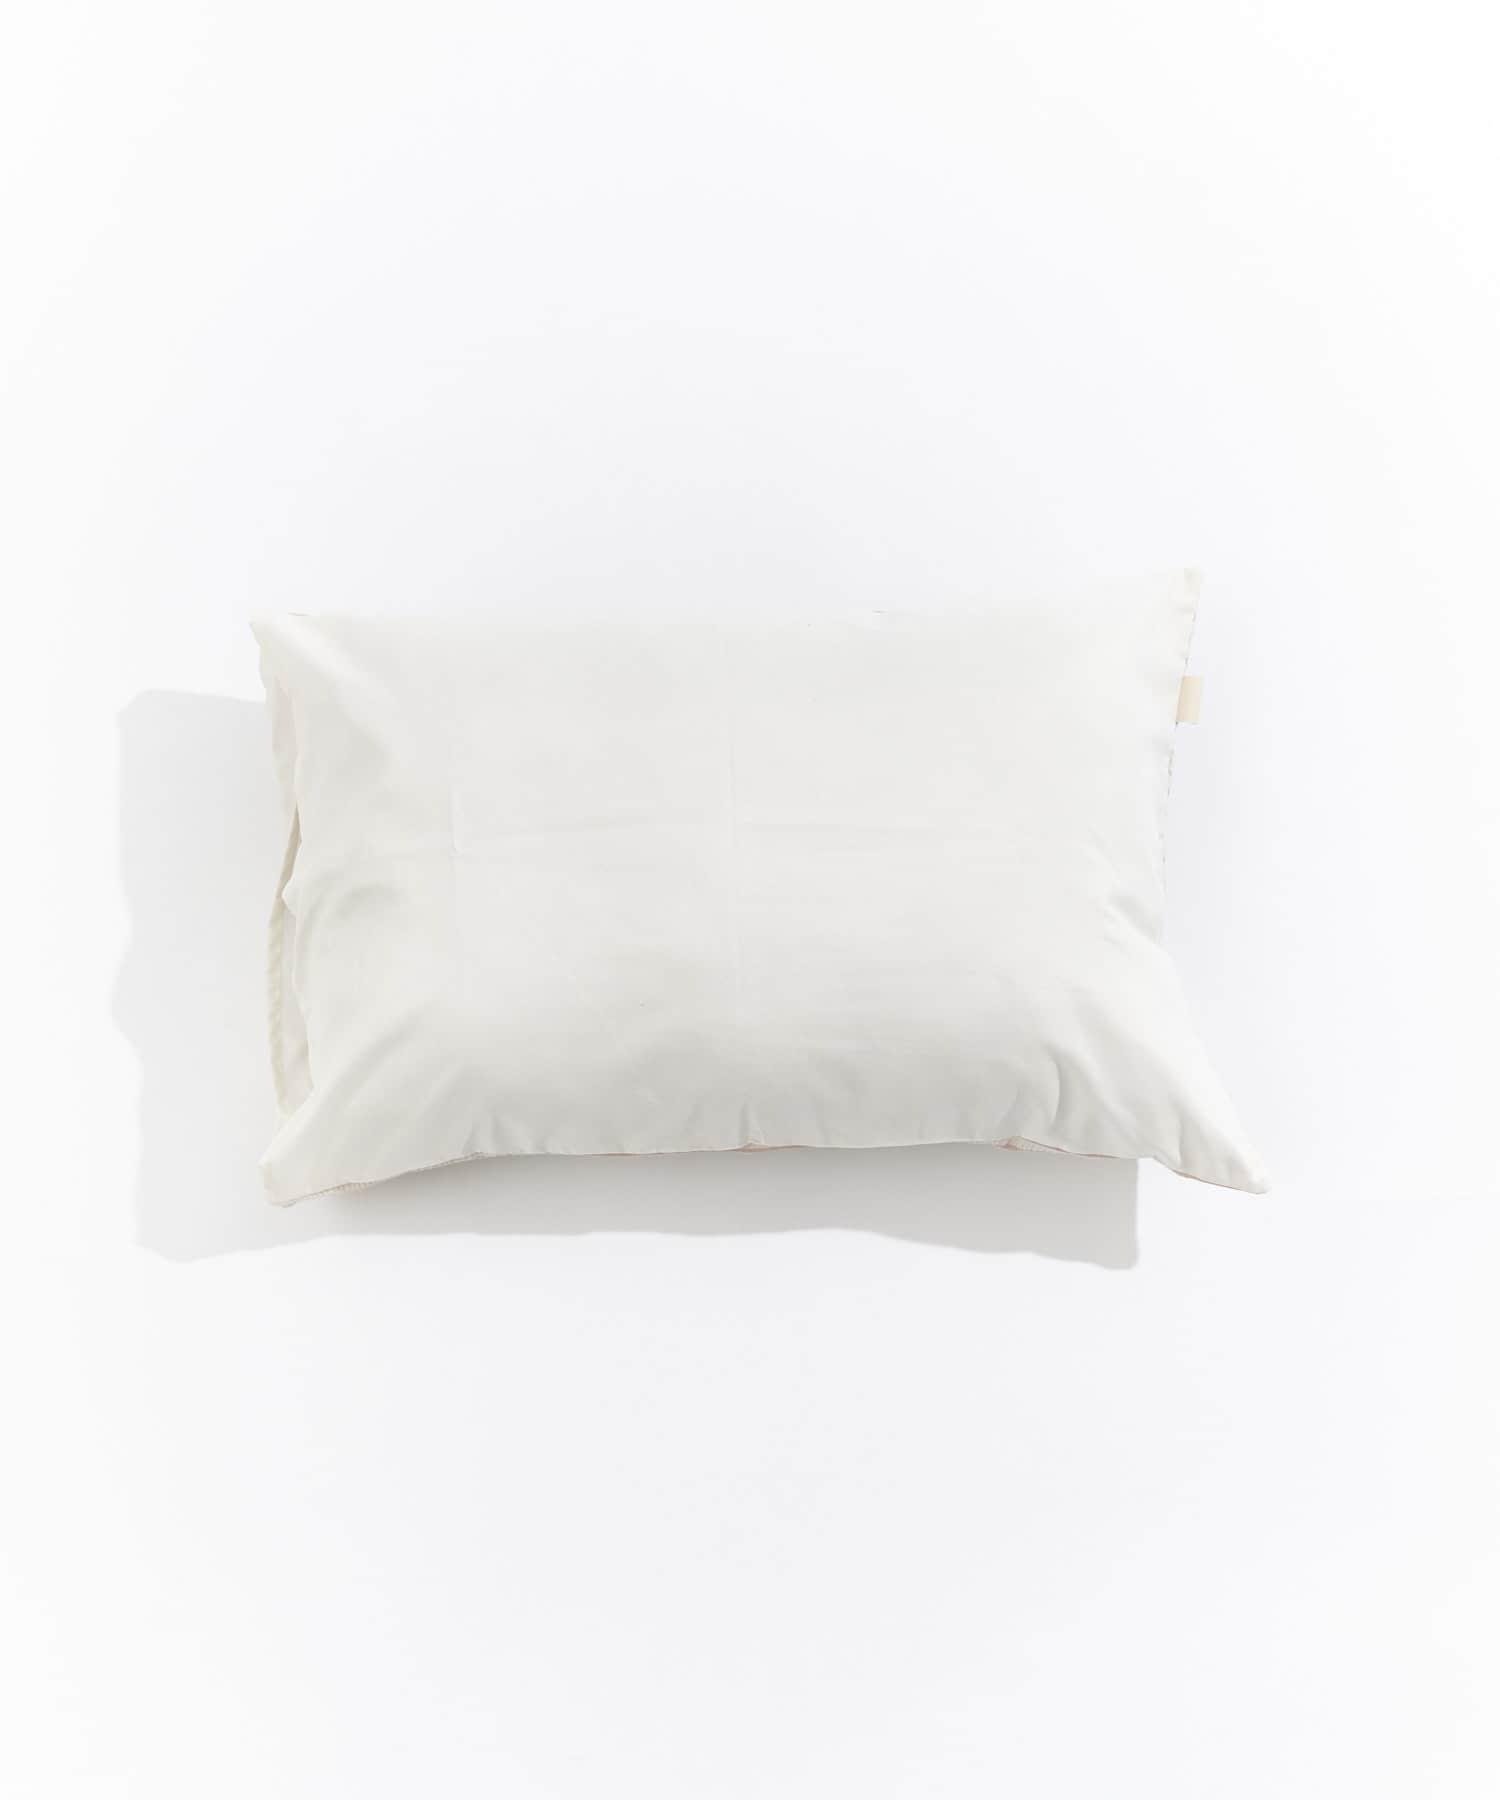 3COINS(スリーコインズ) 【涼しく、心地よく。】枕カバー